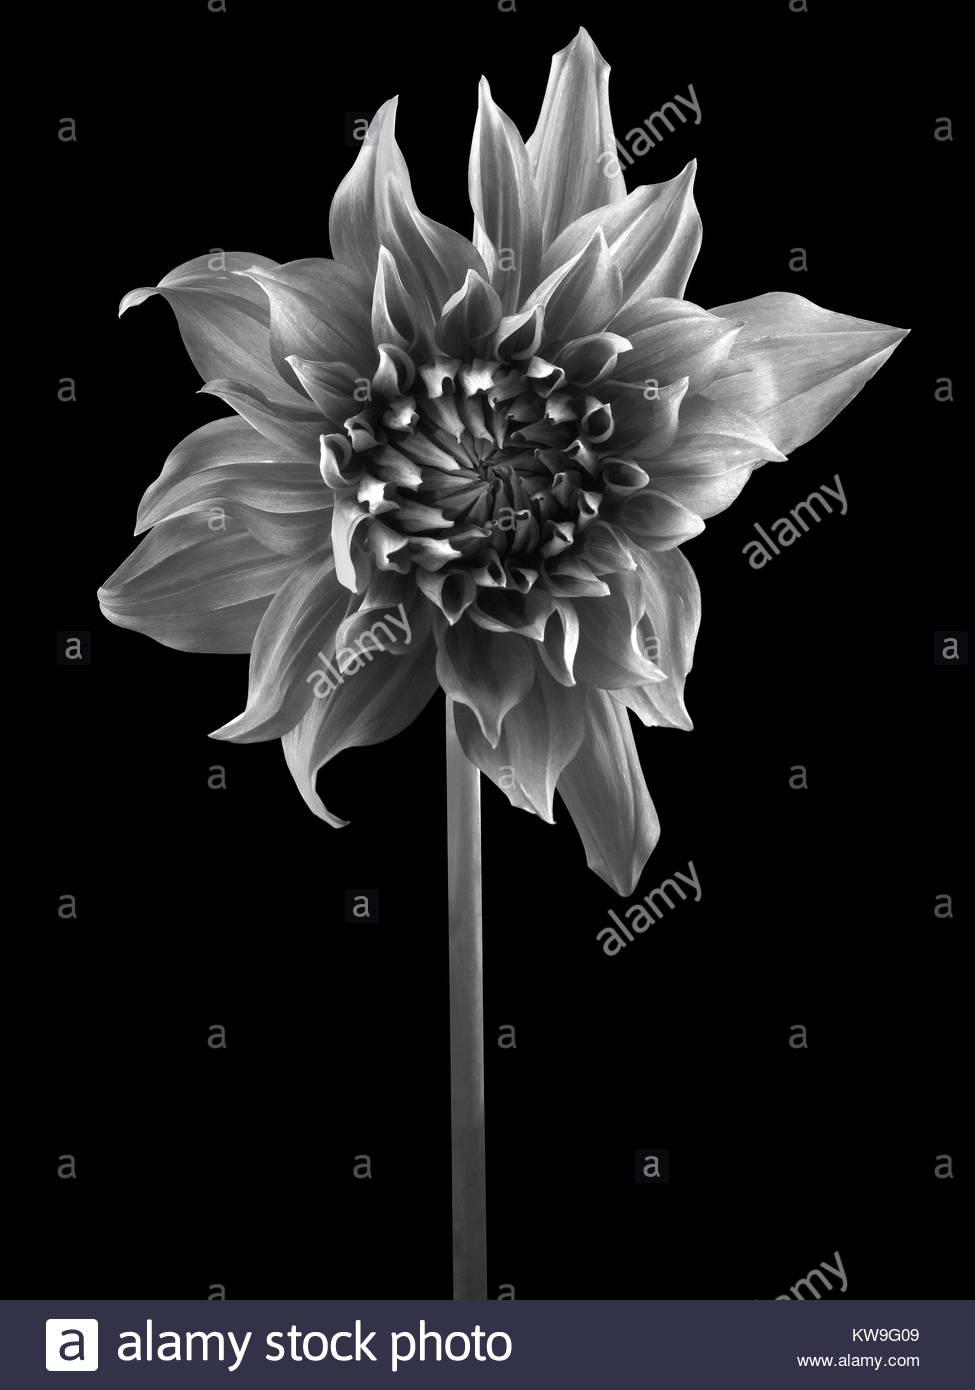 Dahlia Flower Black And White Stock Photos Images Alamy